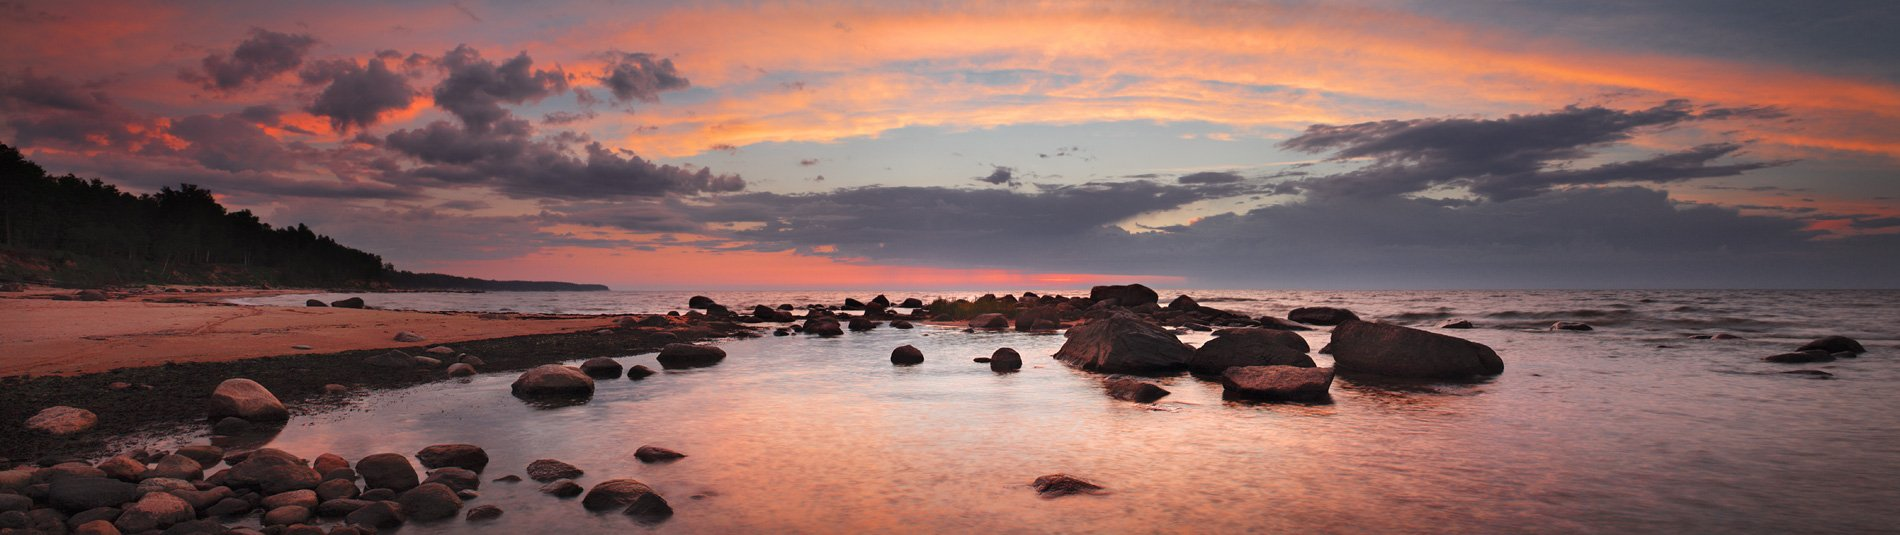 латвия, вечер, море, облака, купол, закат, камни, курмрагс, панорама, Karlis Keisters